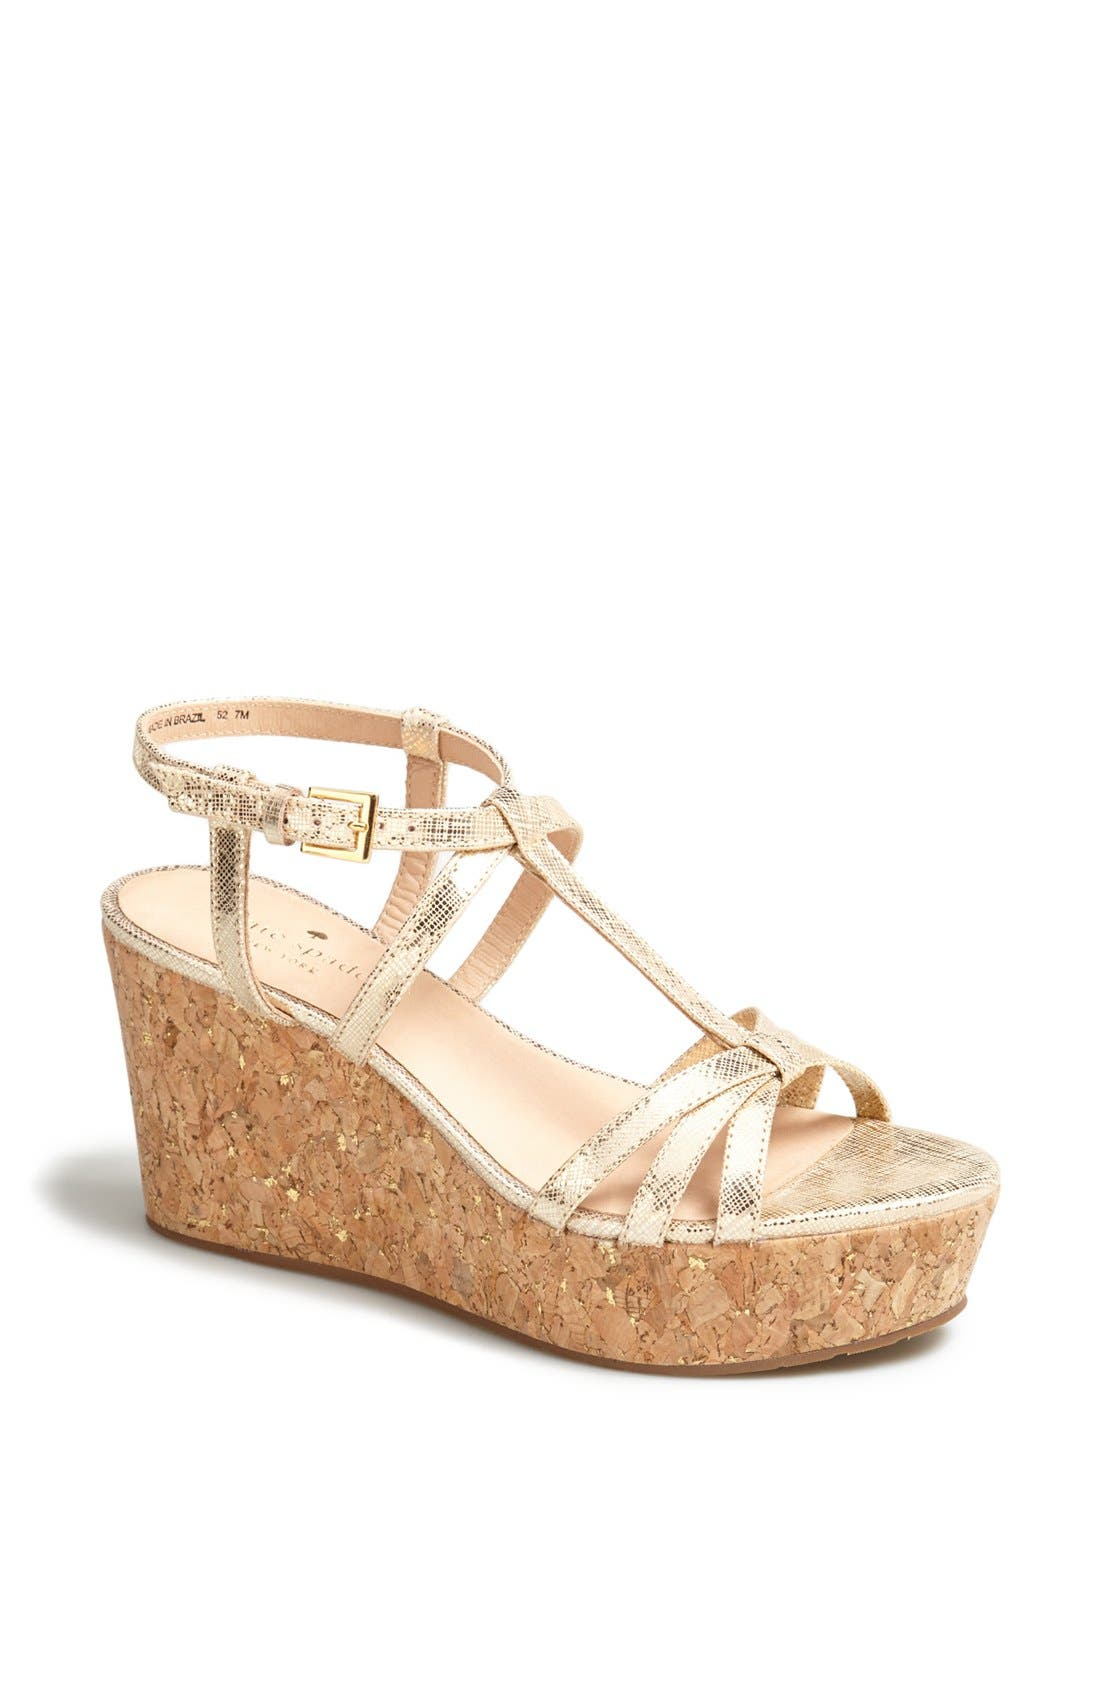 Main Image - kate spade new york 'tropez' wedge platform sandal